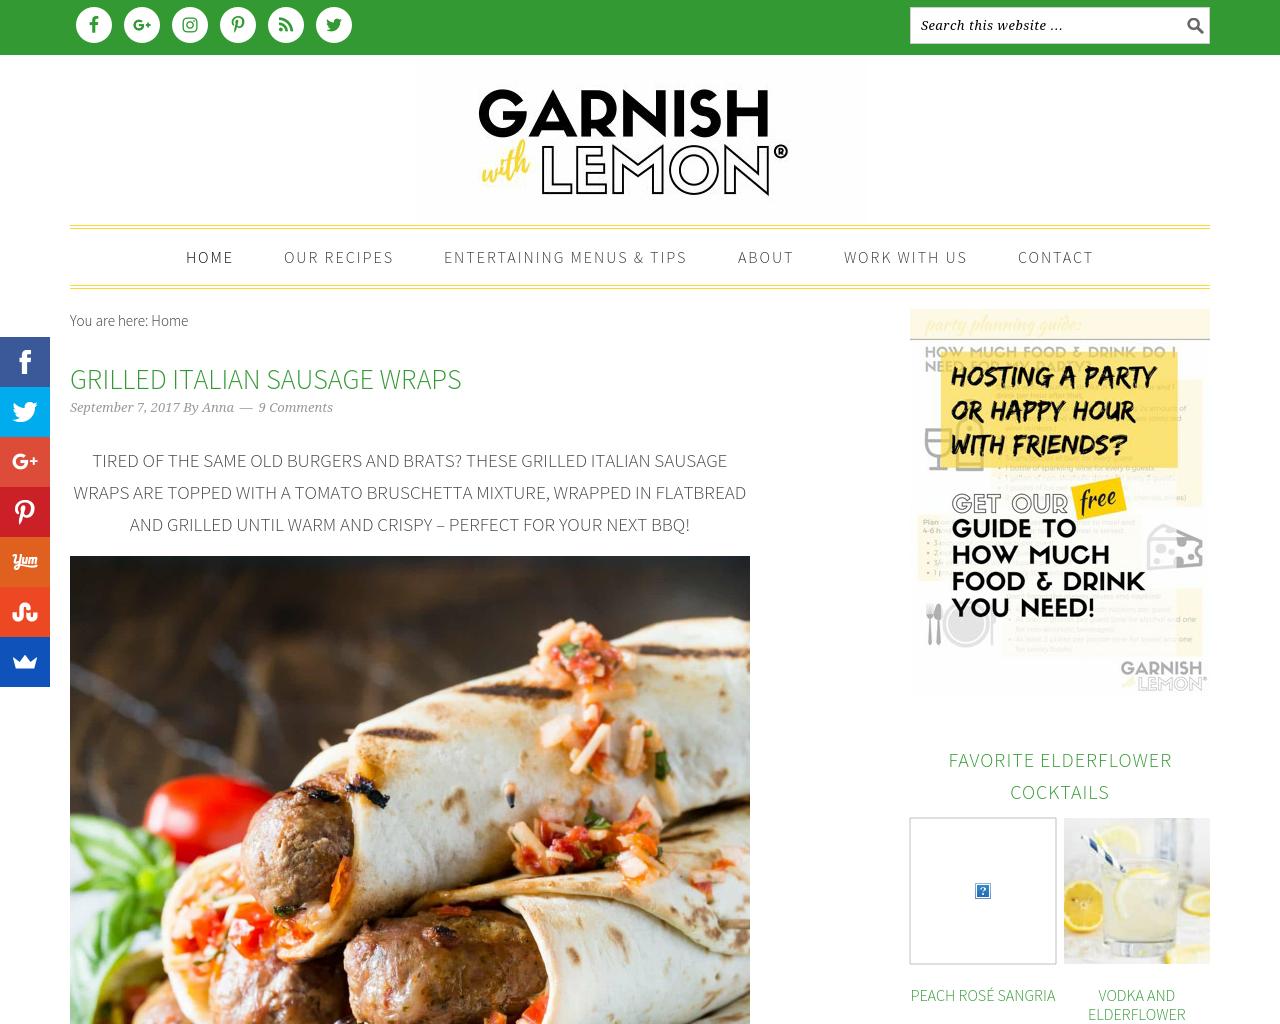 Garnish-with-Lemon-Advertising-Reviews-Pricing